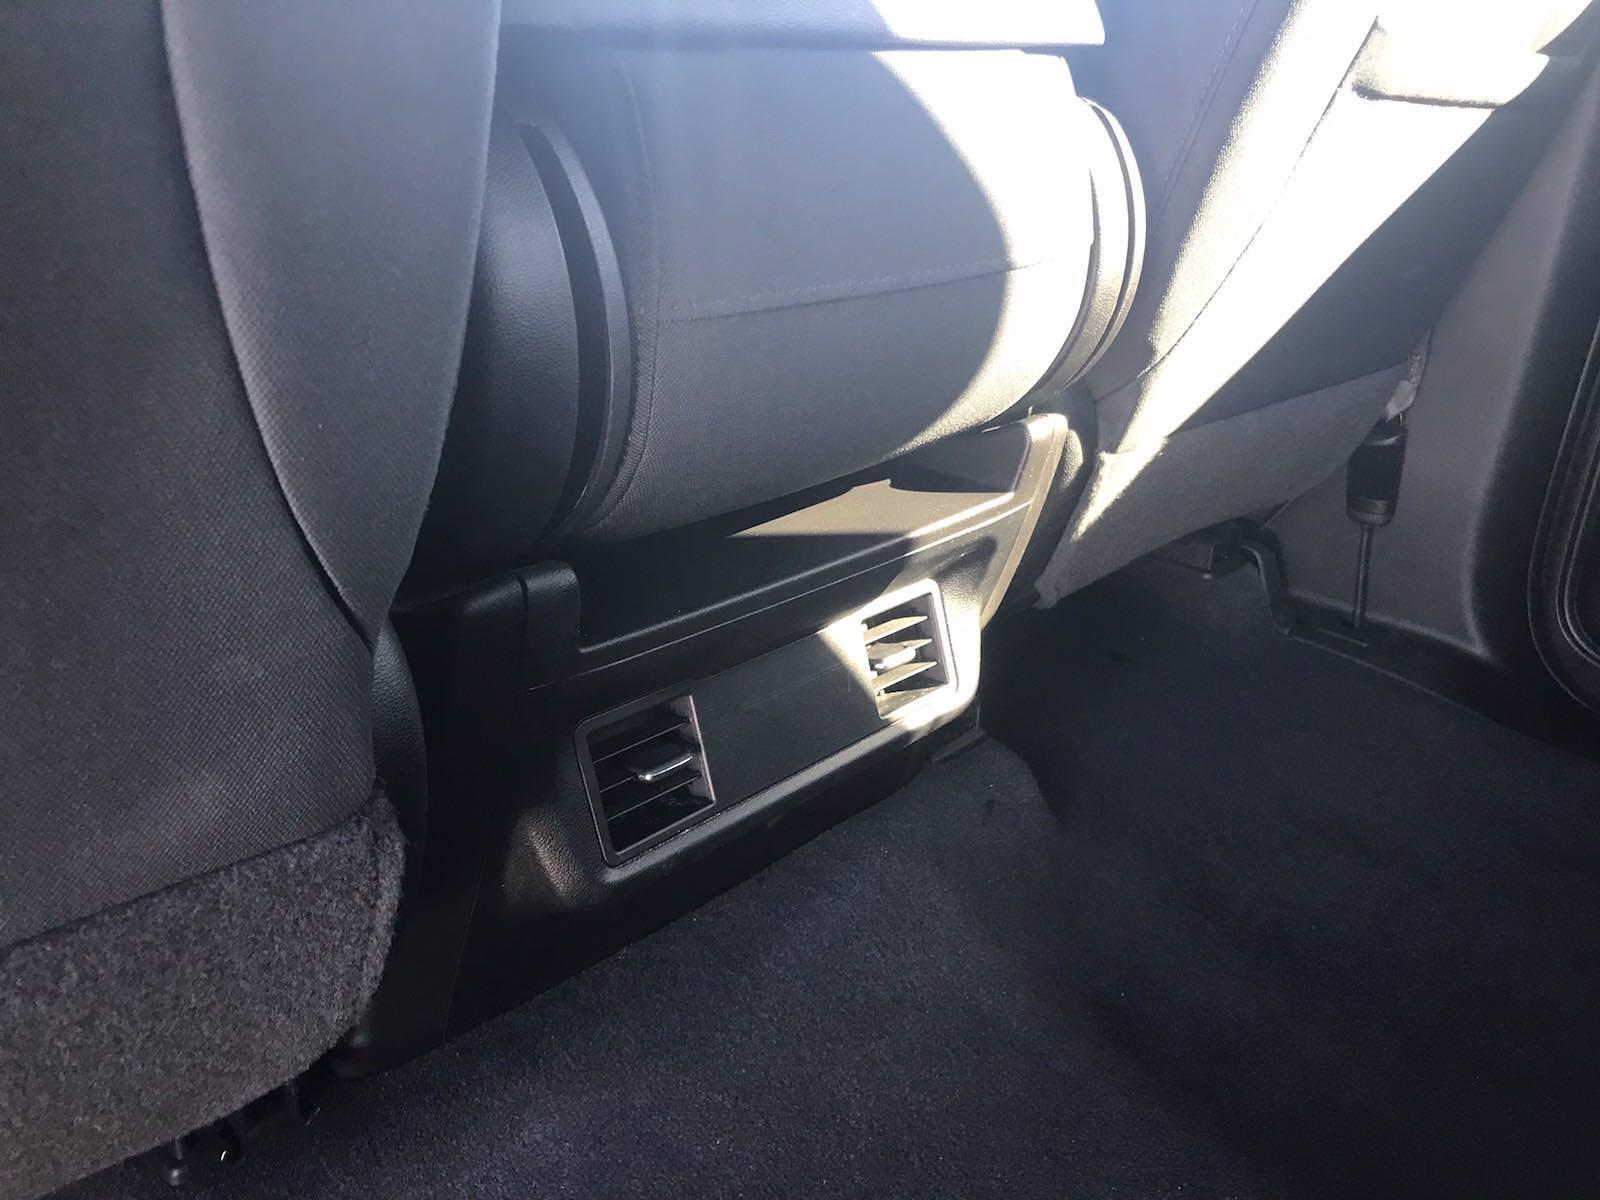 2020 Chevrolet Silverado 1500 Crew Cab 4x4, Pickup #16456P - photo 41